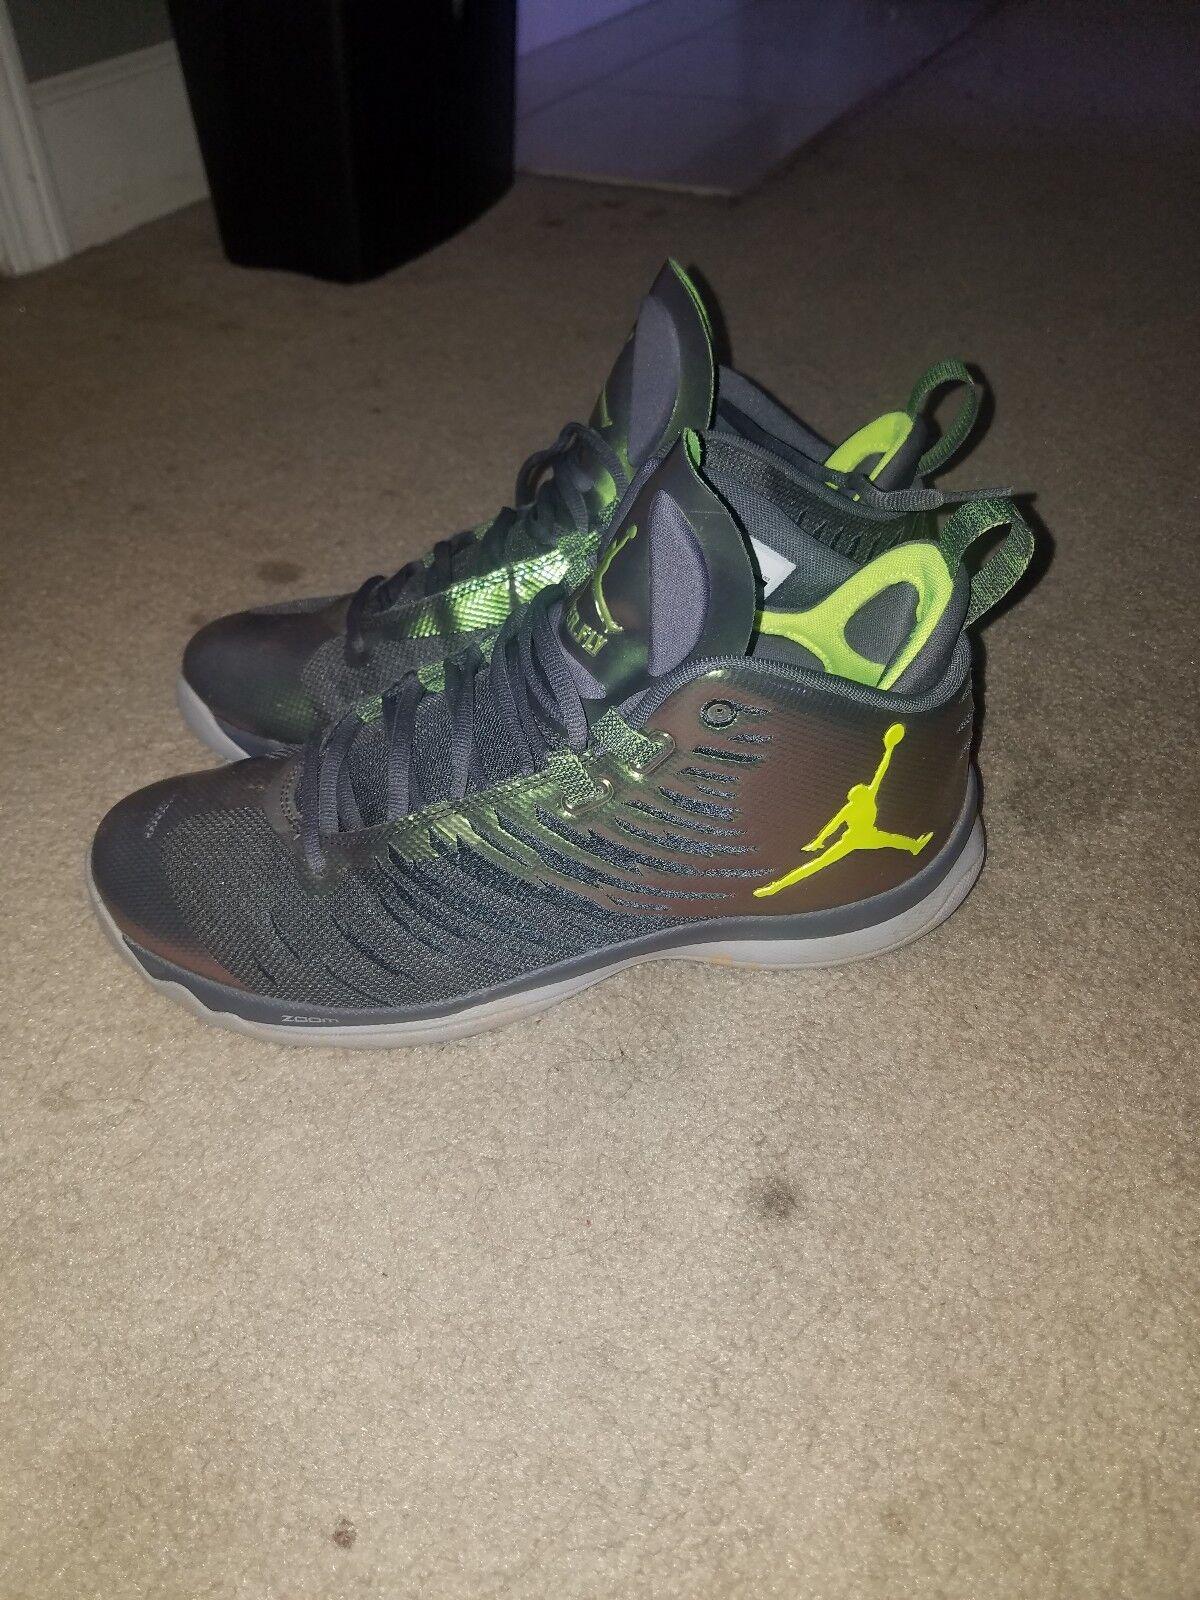 Jordans Size 10.5 Green Metallic Superfly shoes